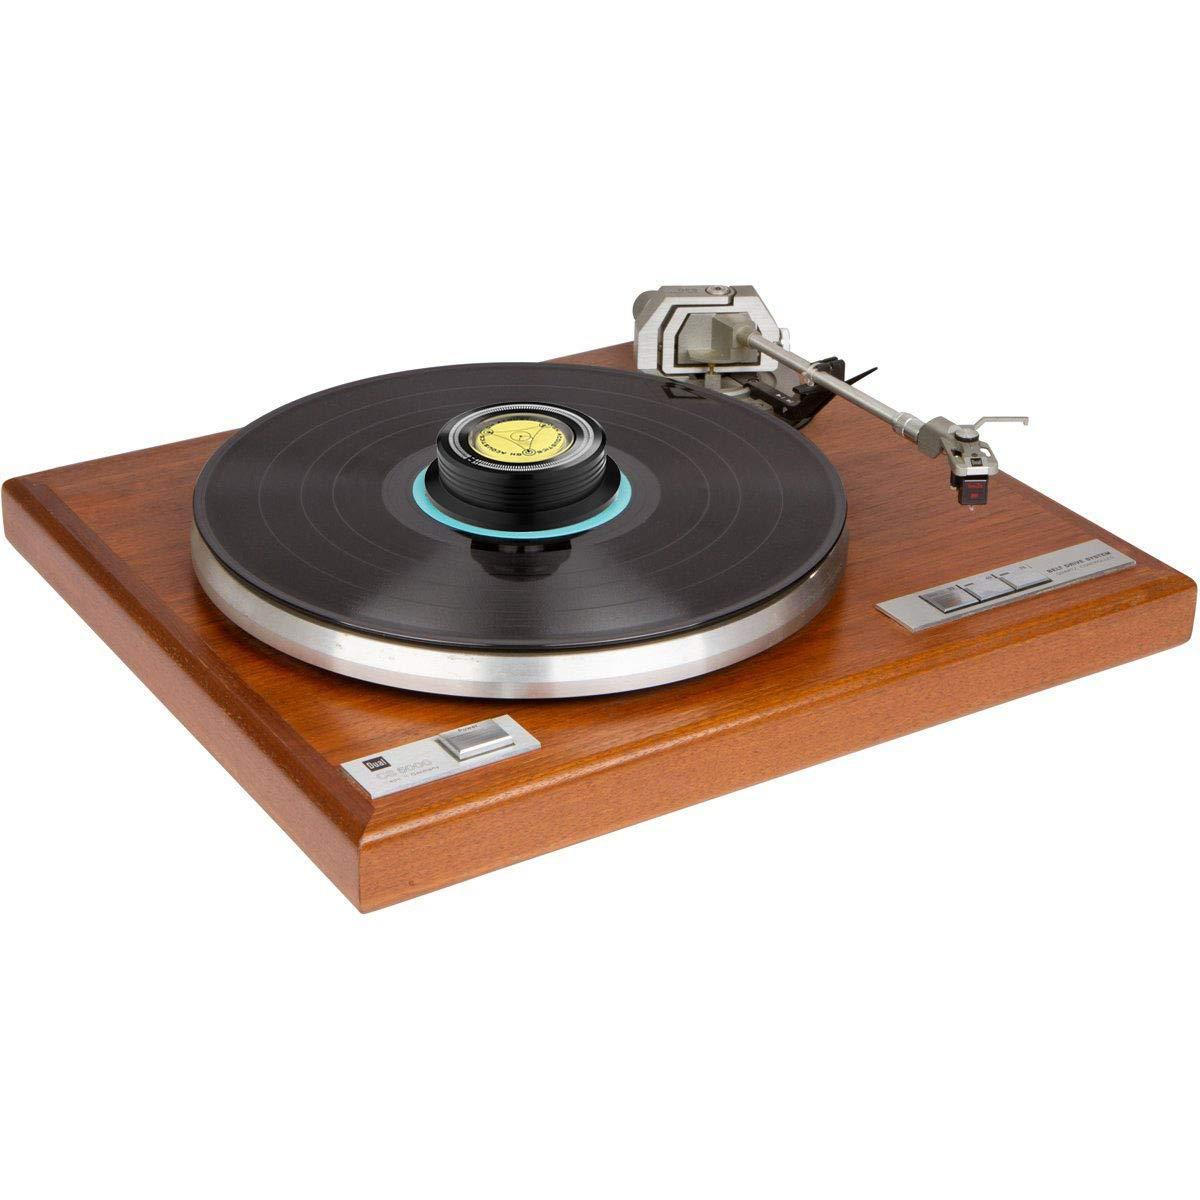 nobsound 3 en 1 - 50 hz Record Weight Tocadiscos vinilo Clamp LP ...